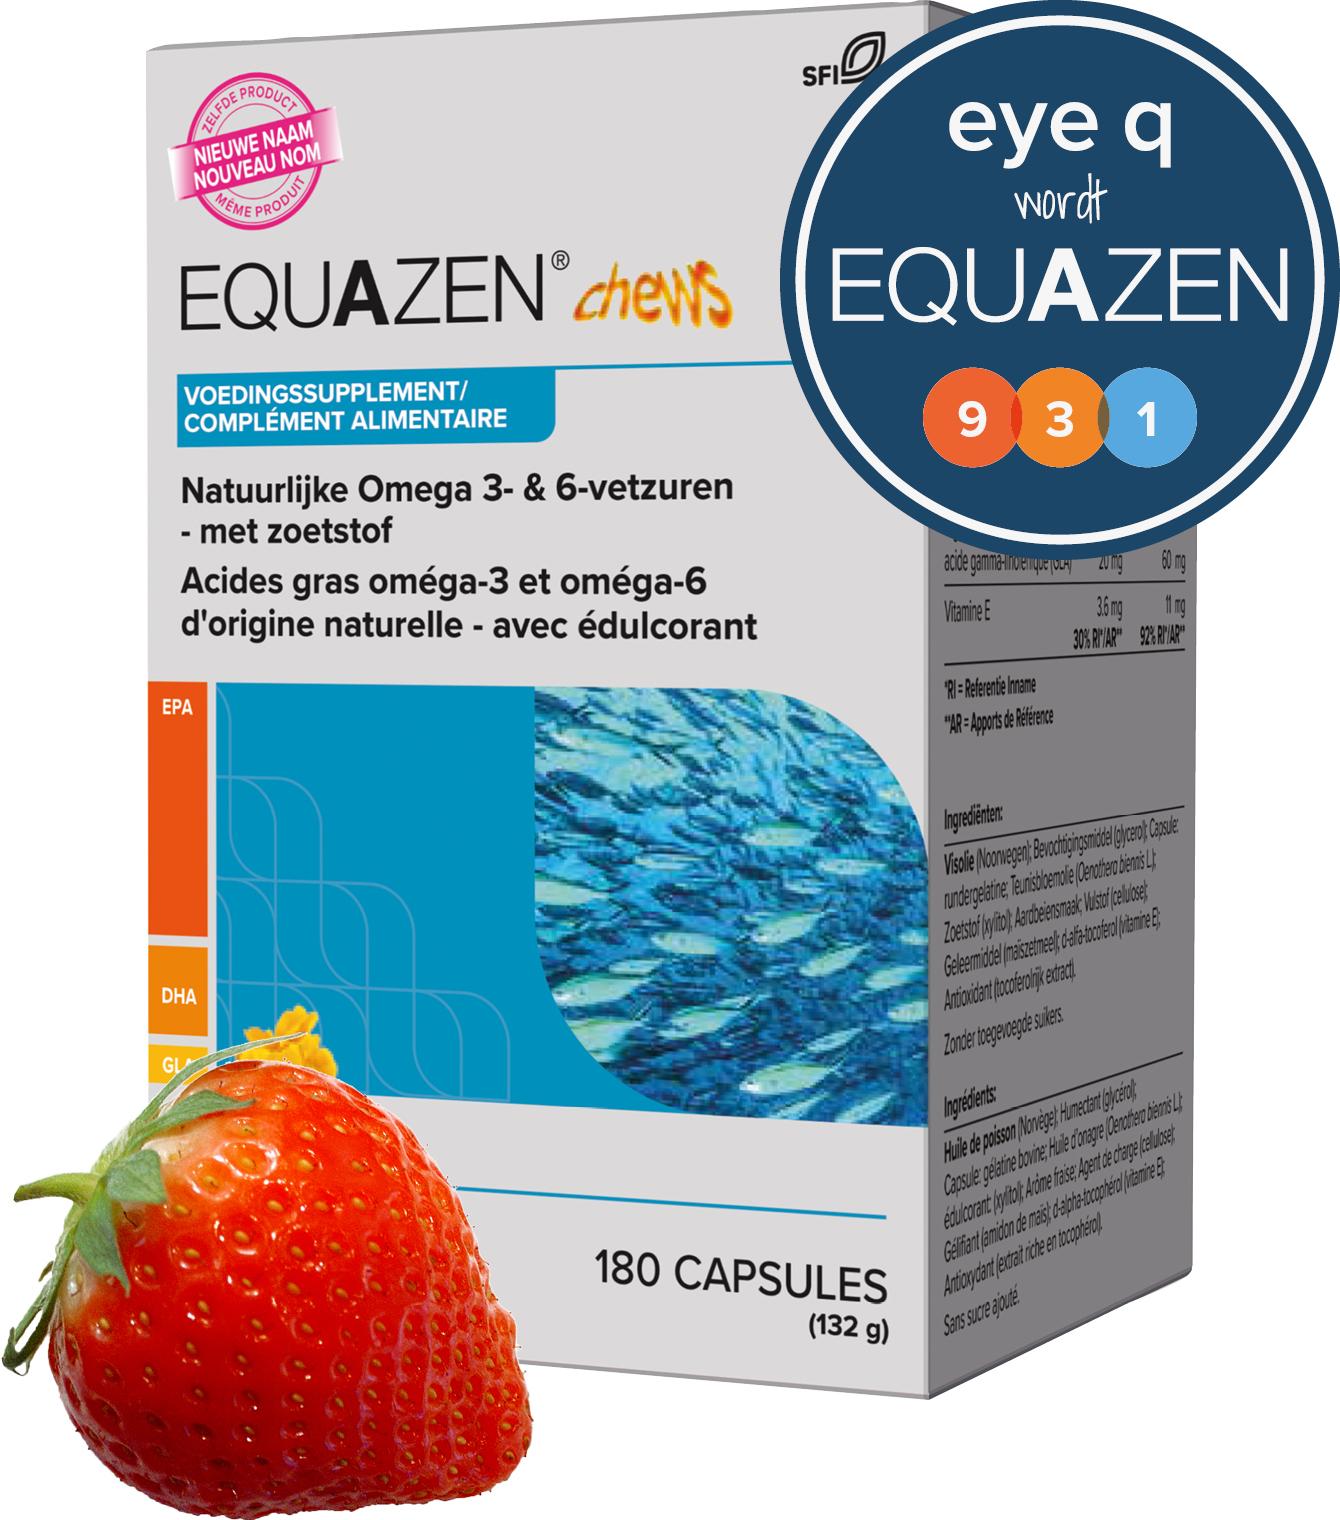 Equazen Chews kauwcapsules met aardbeiensmaak - omega 3- en 6-vetzuren EPA, DHA, GLA - Eye Q wordt Equazen